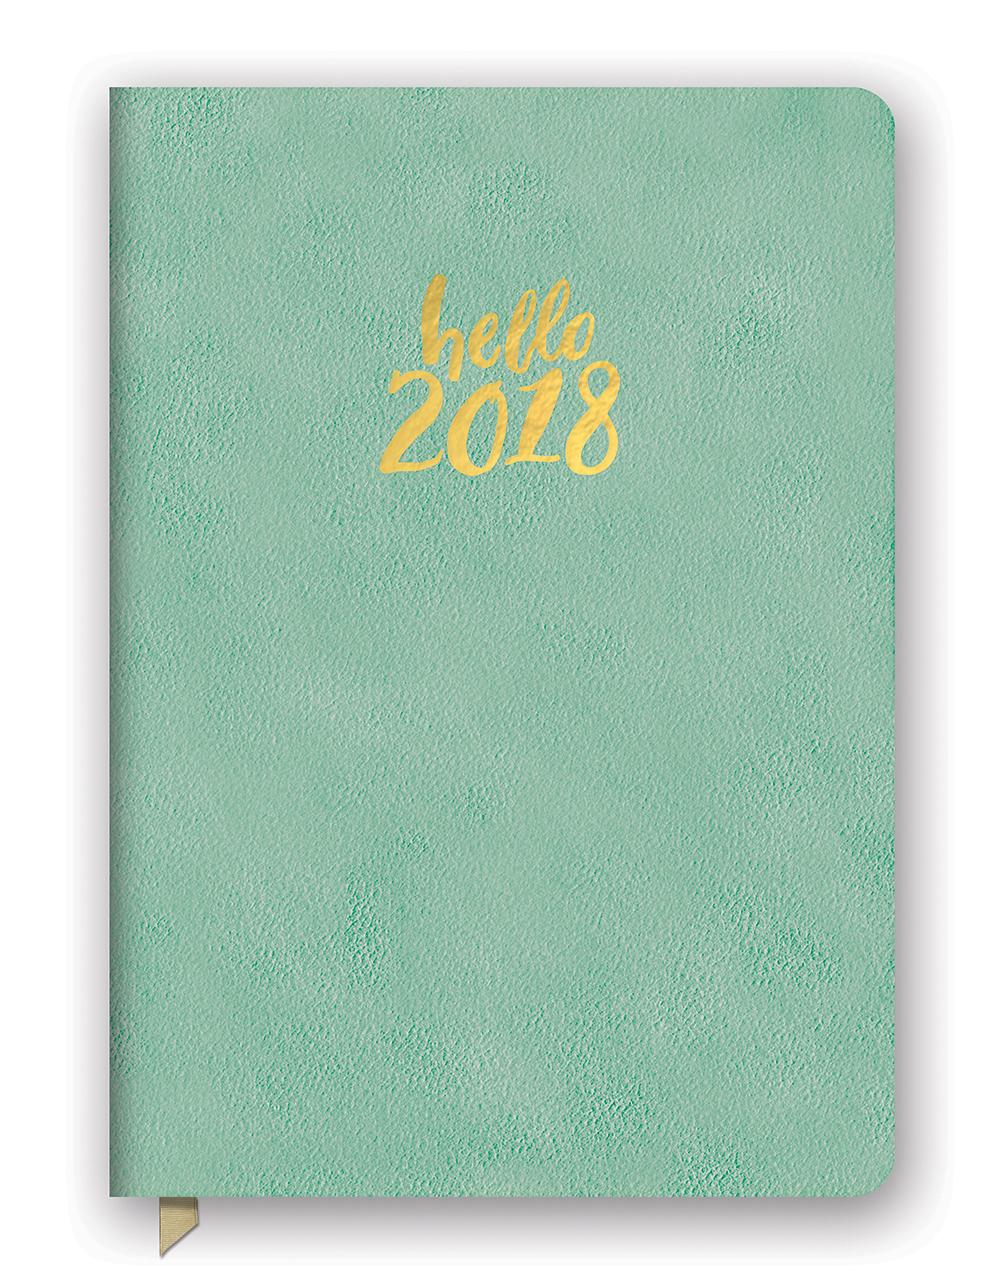 Hello Sea Green Leatheresque Medium Weekly Agenda 2018 by Orange Circle Studio 9781682582466